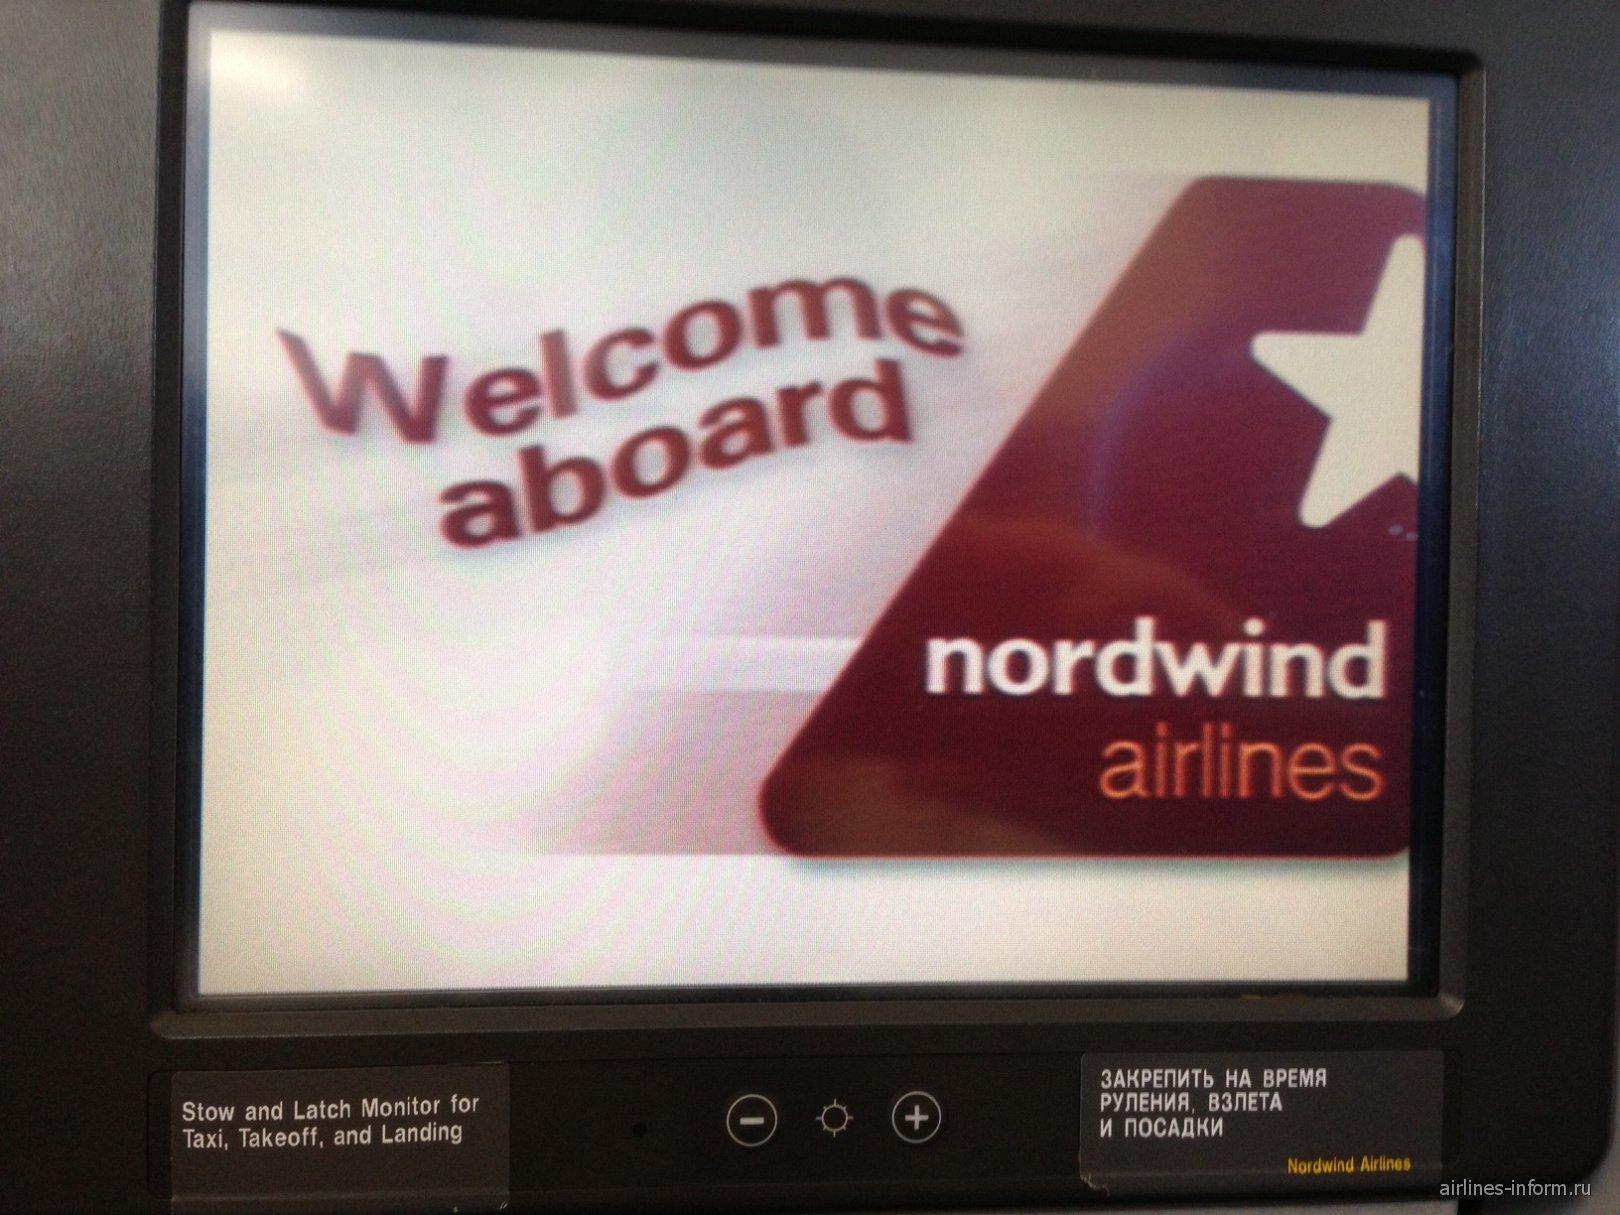 Nord wind airlines, Северный ветер